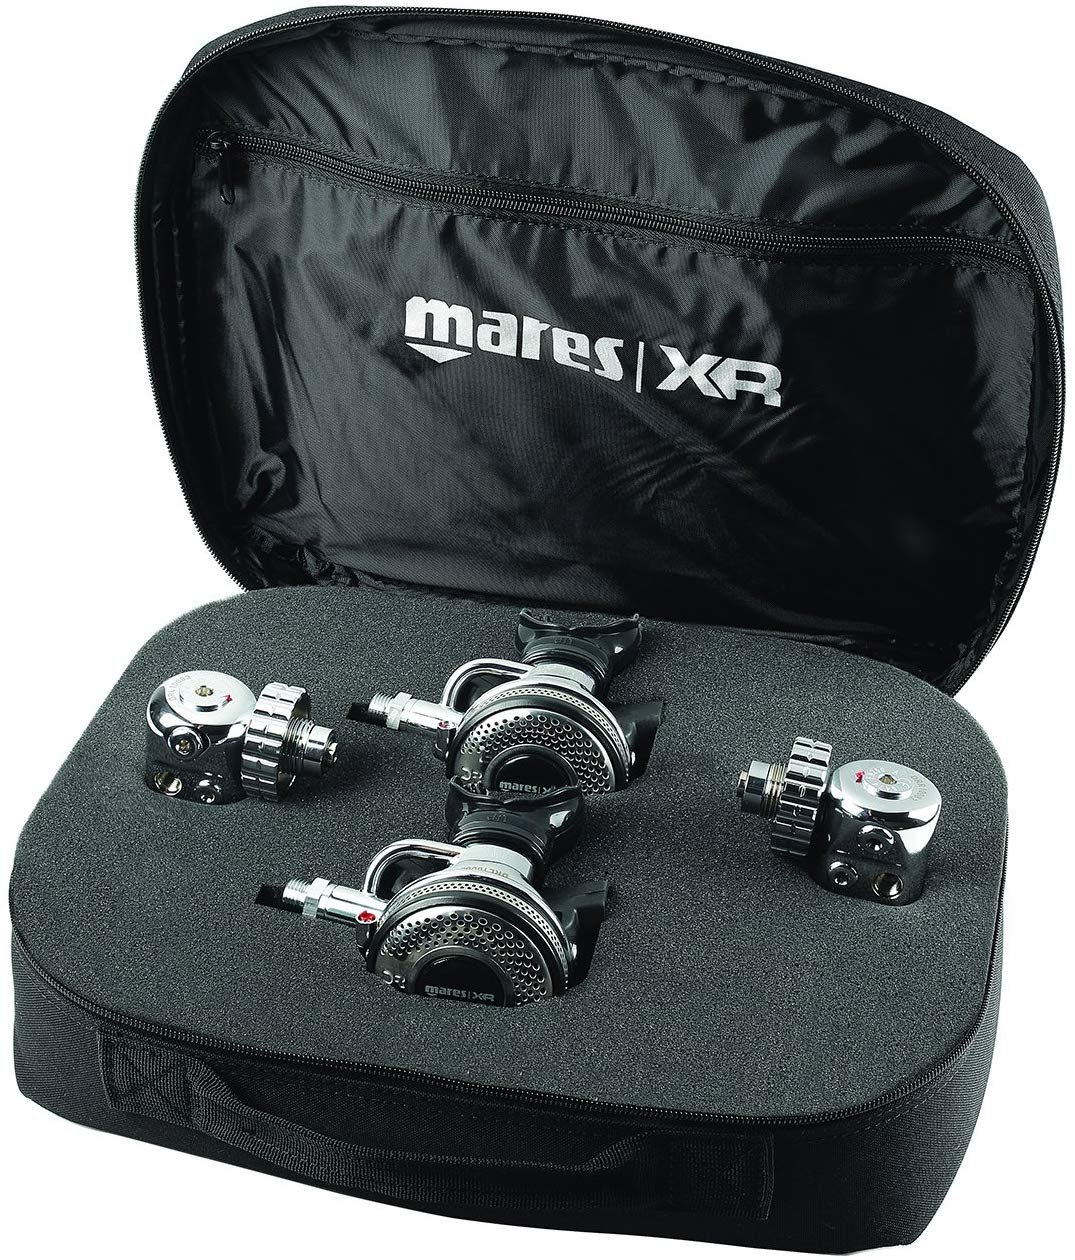 Mares - 25XR - DR FULL TEK SET